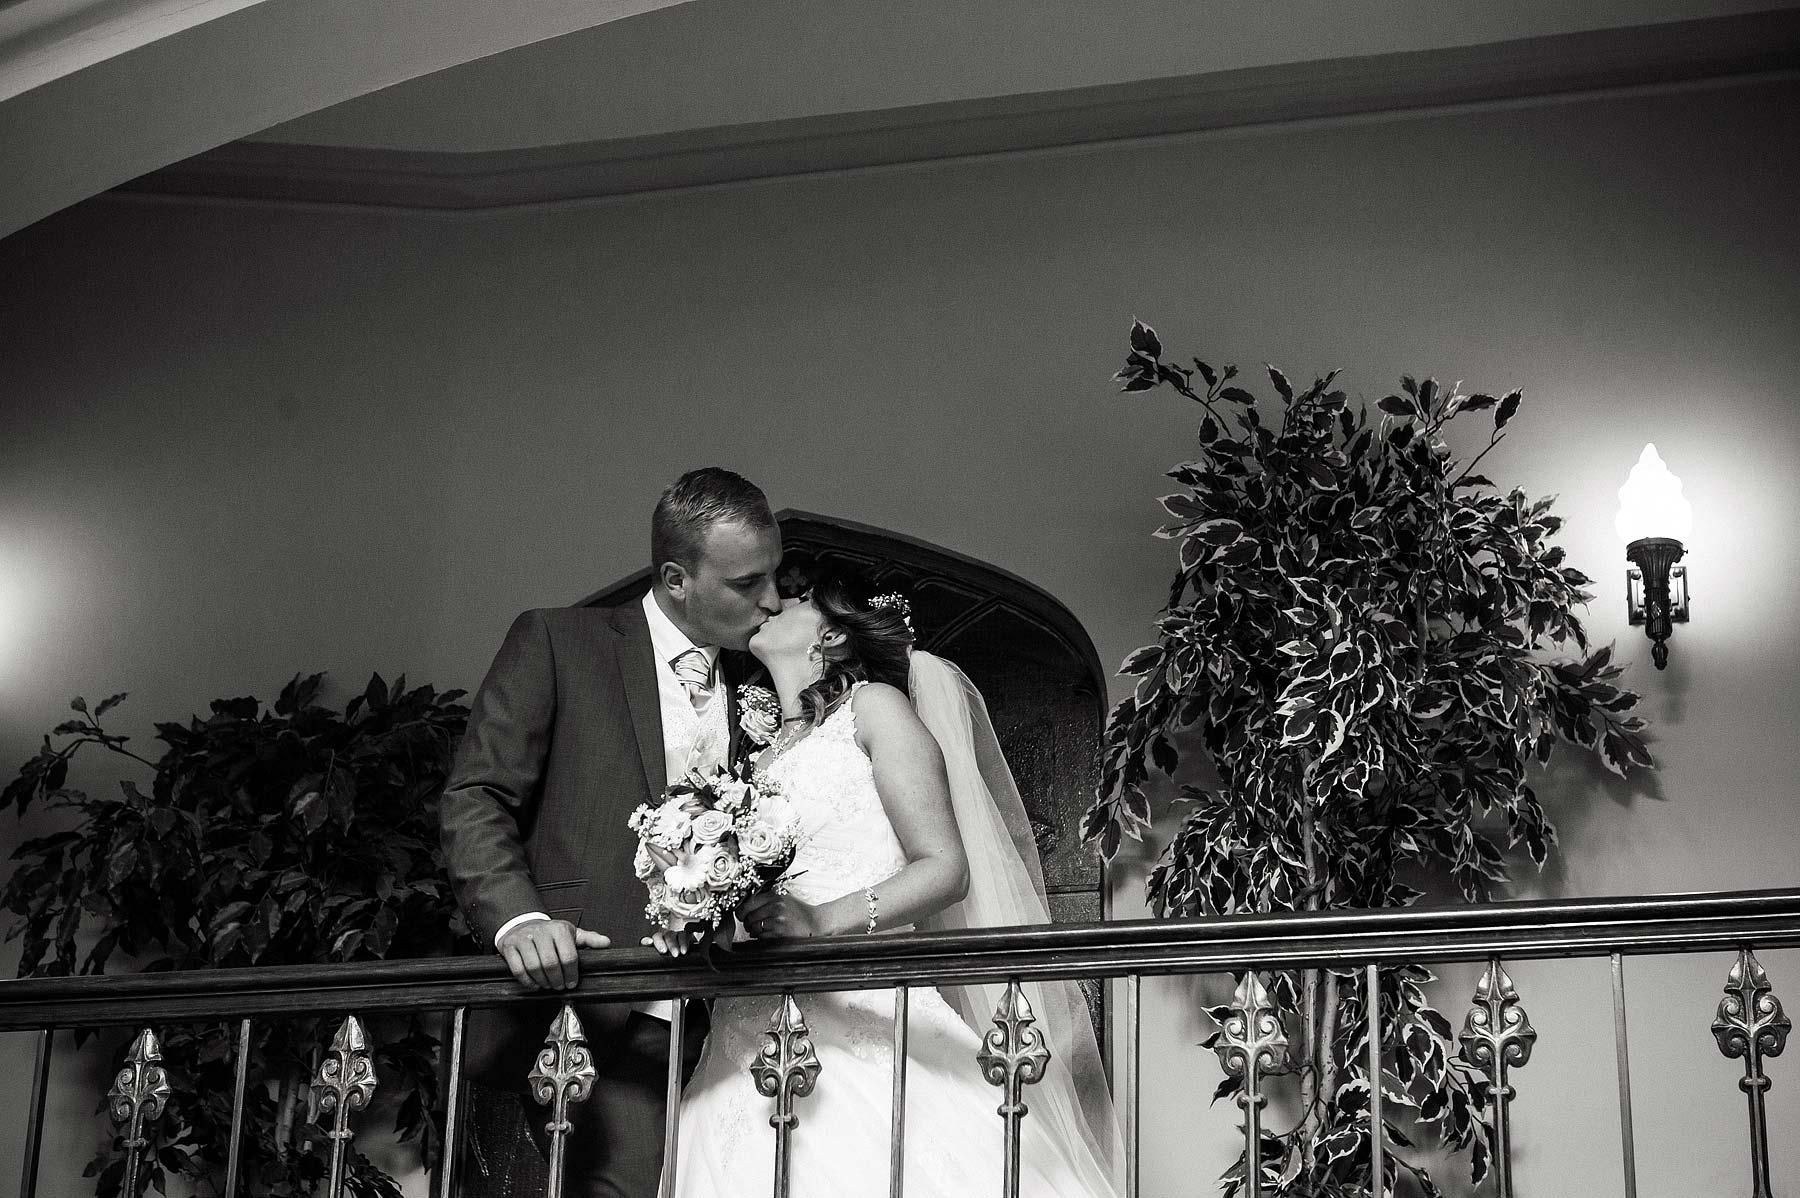 hawkesyard-estate-wedding-photographers-rugeley-075